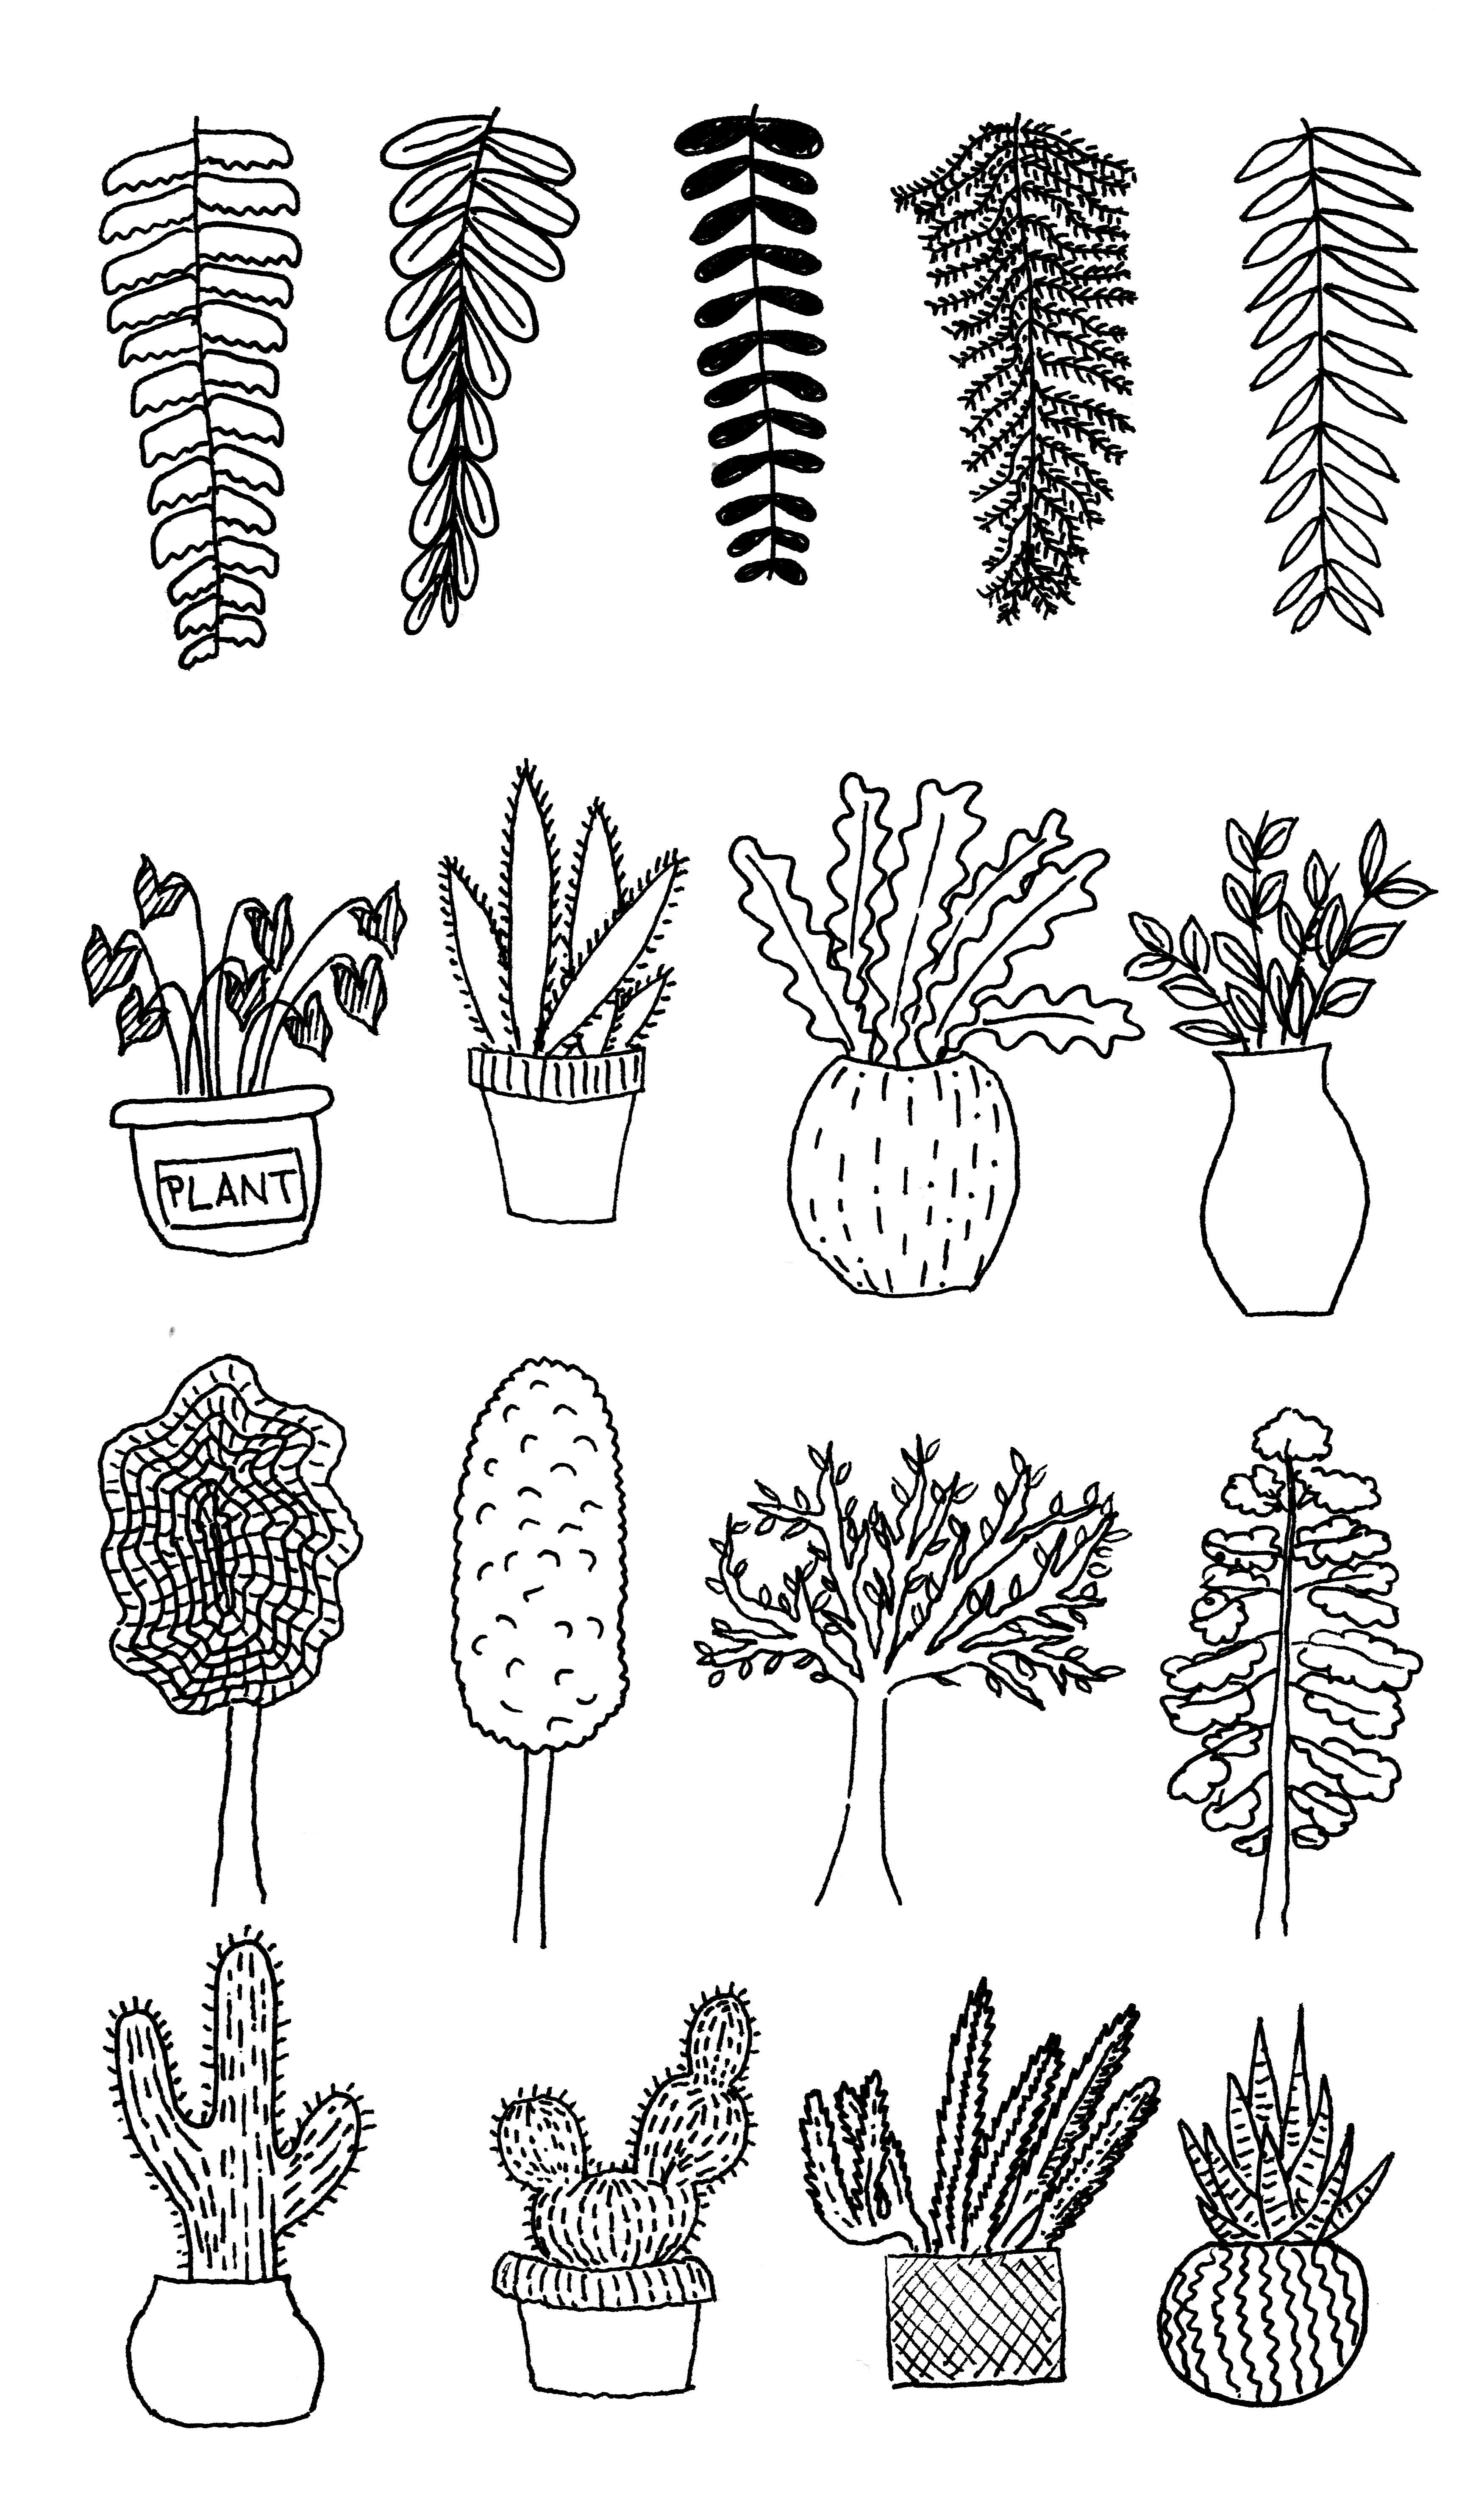 Plants and plants and plants and